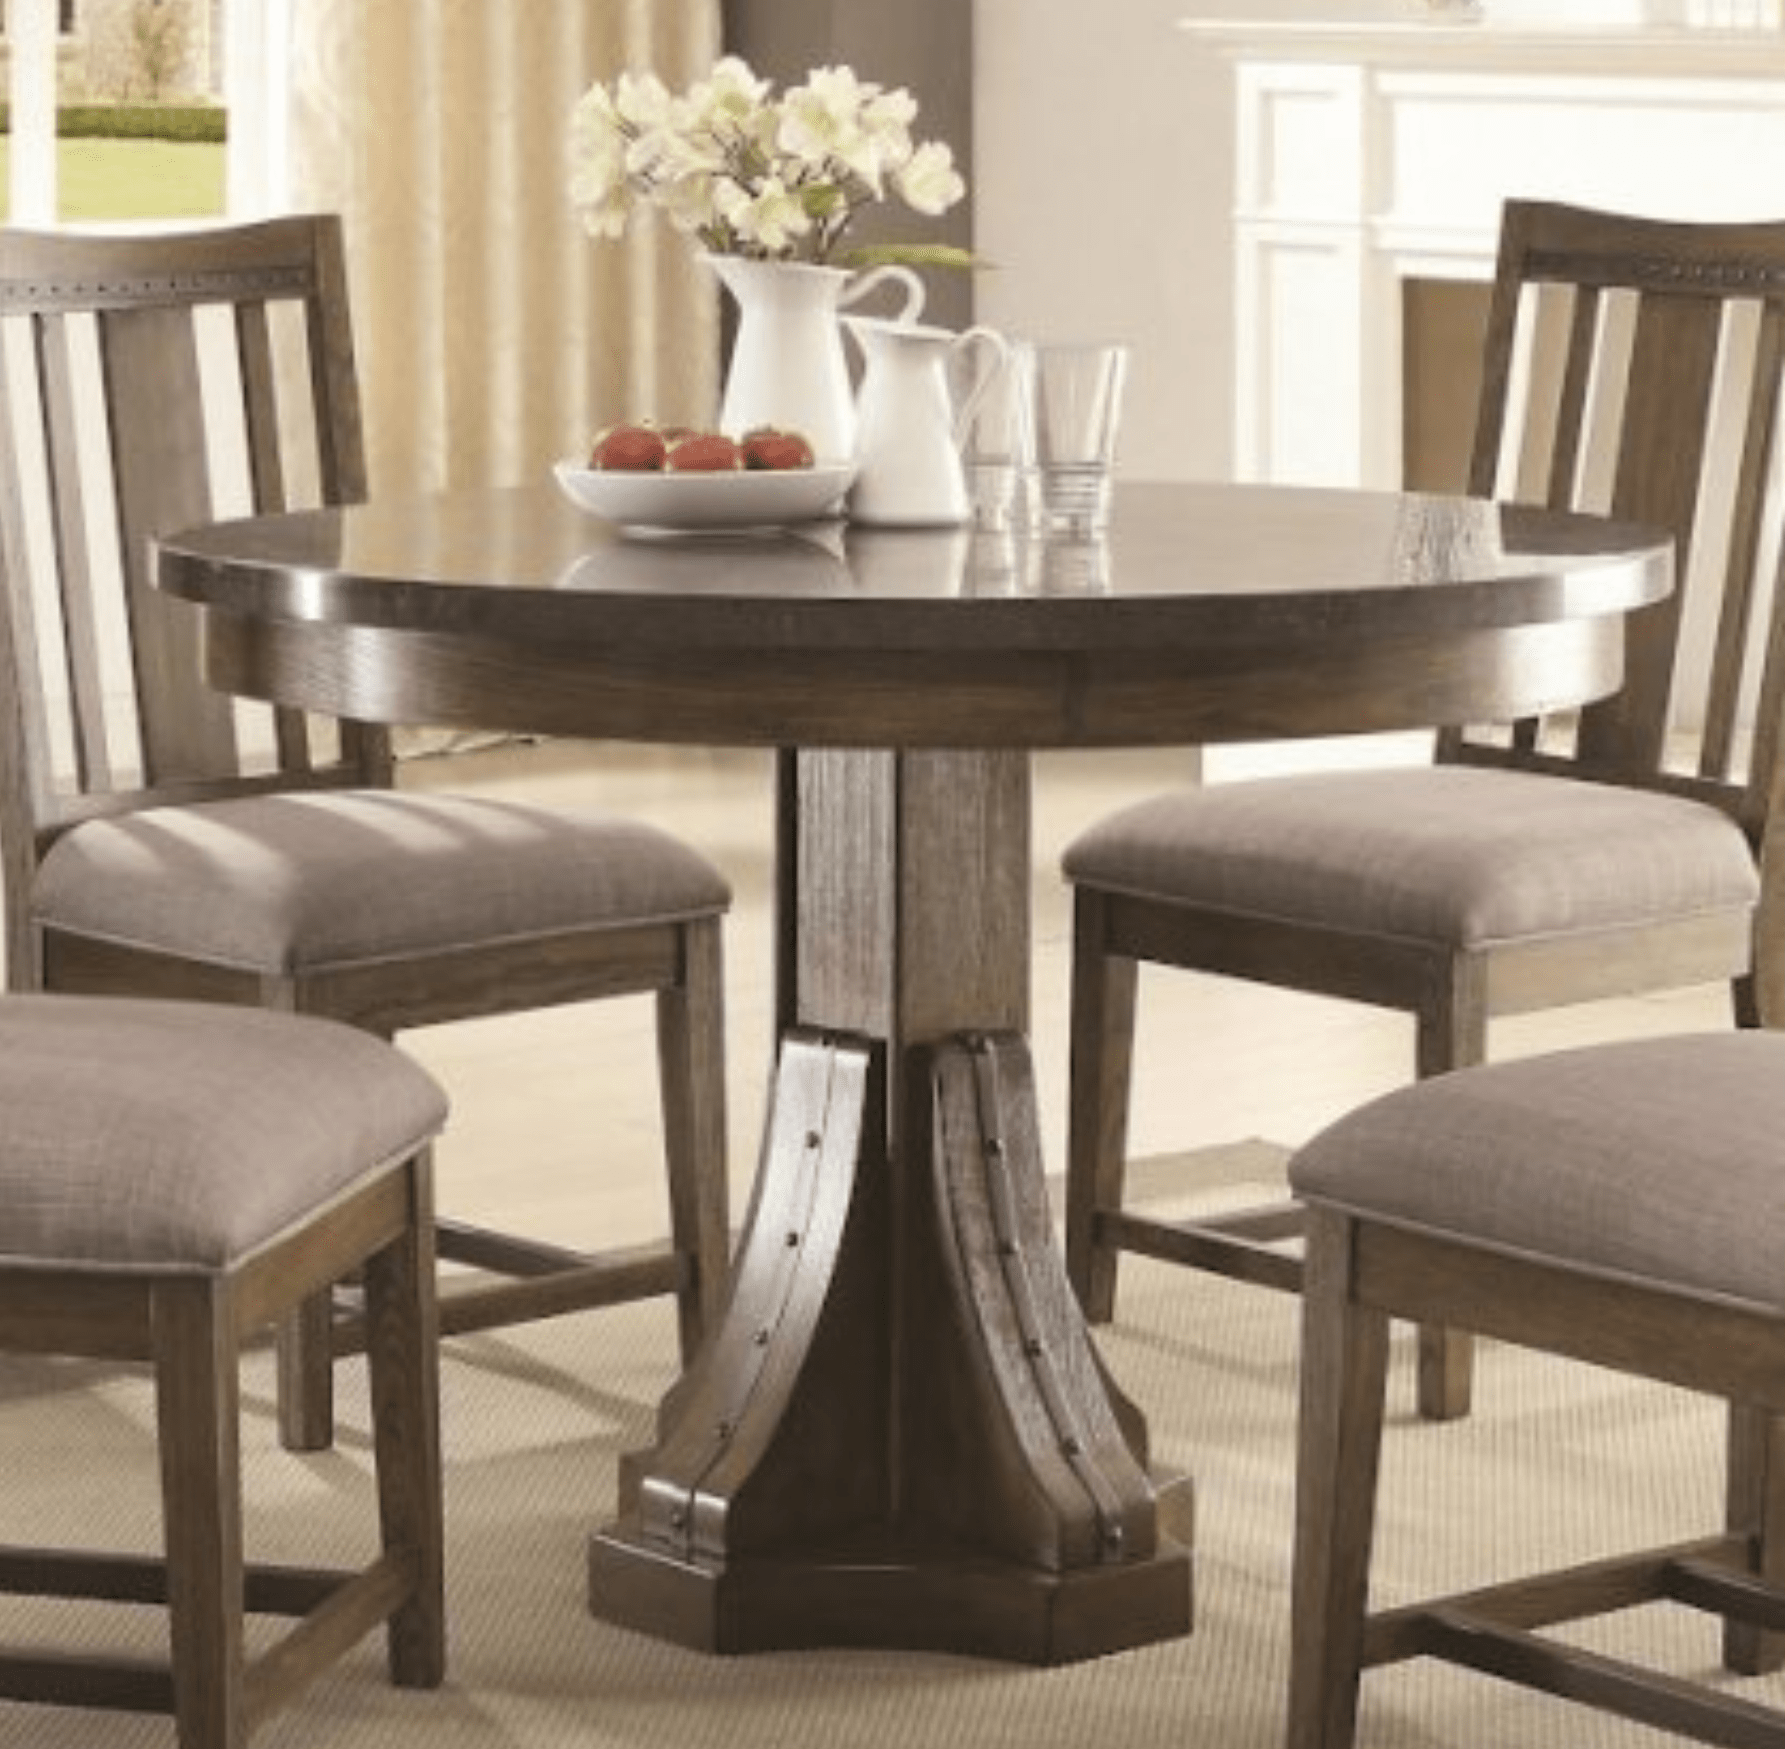 Bluestone round dining table